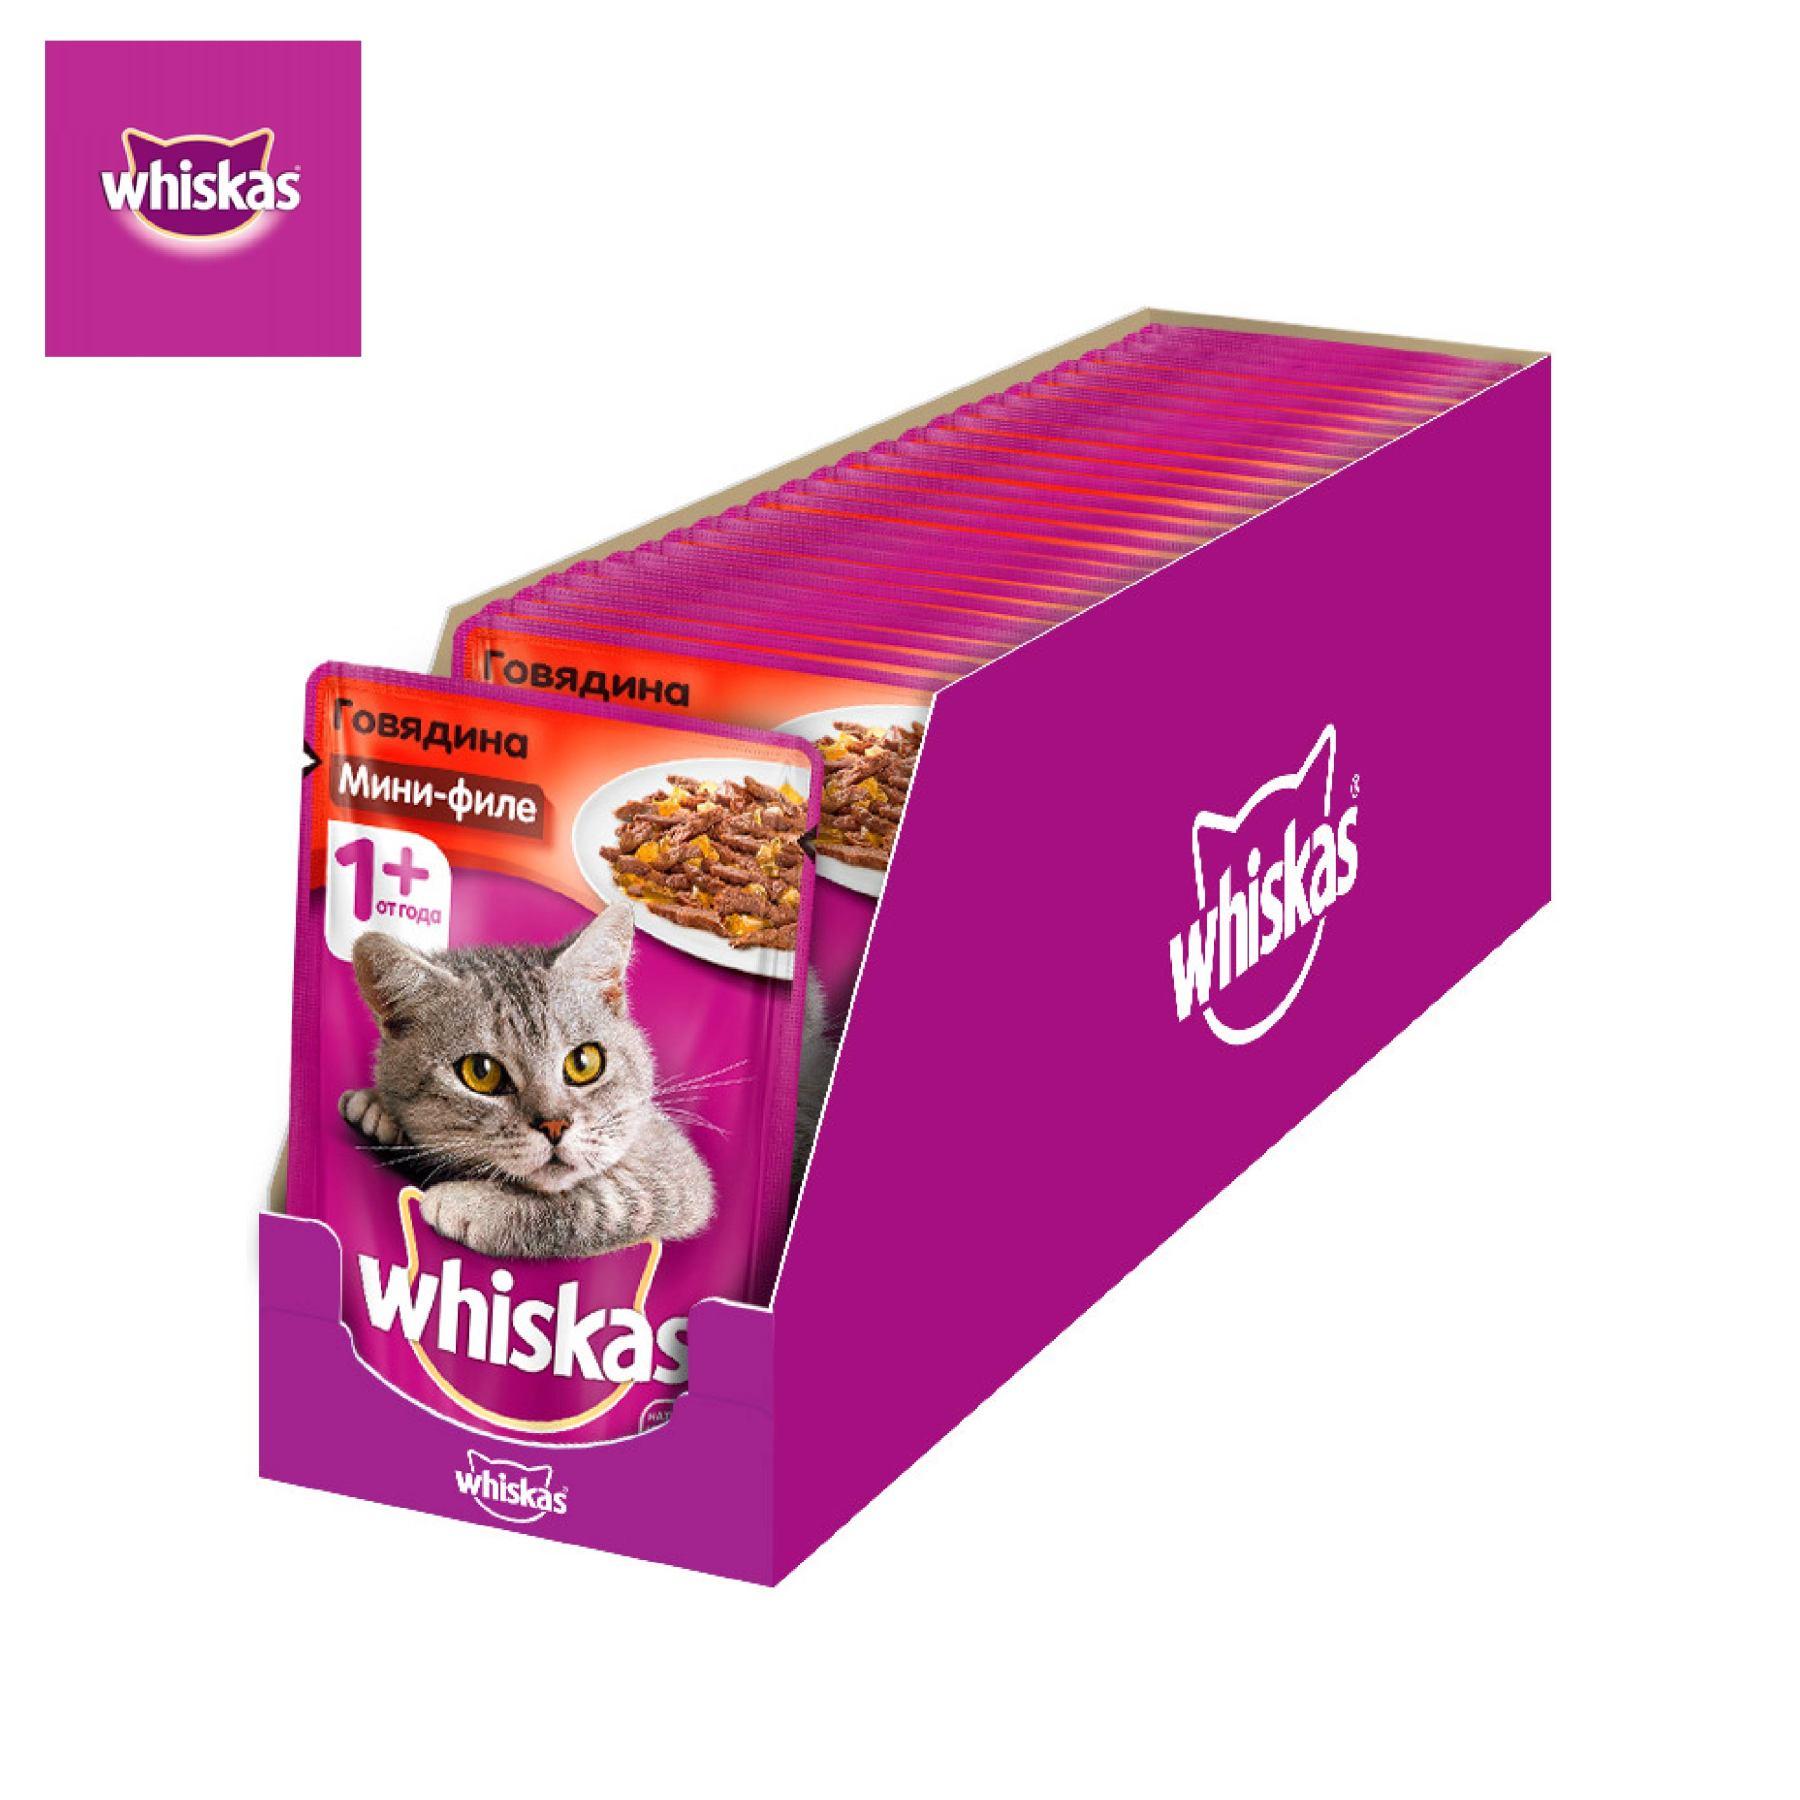 Whiskas® Мини филе с говядиной 24 шт по 85г|Кошачий мягкий корм| |